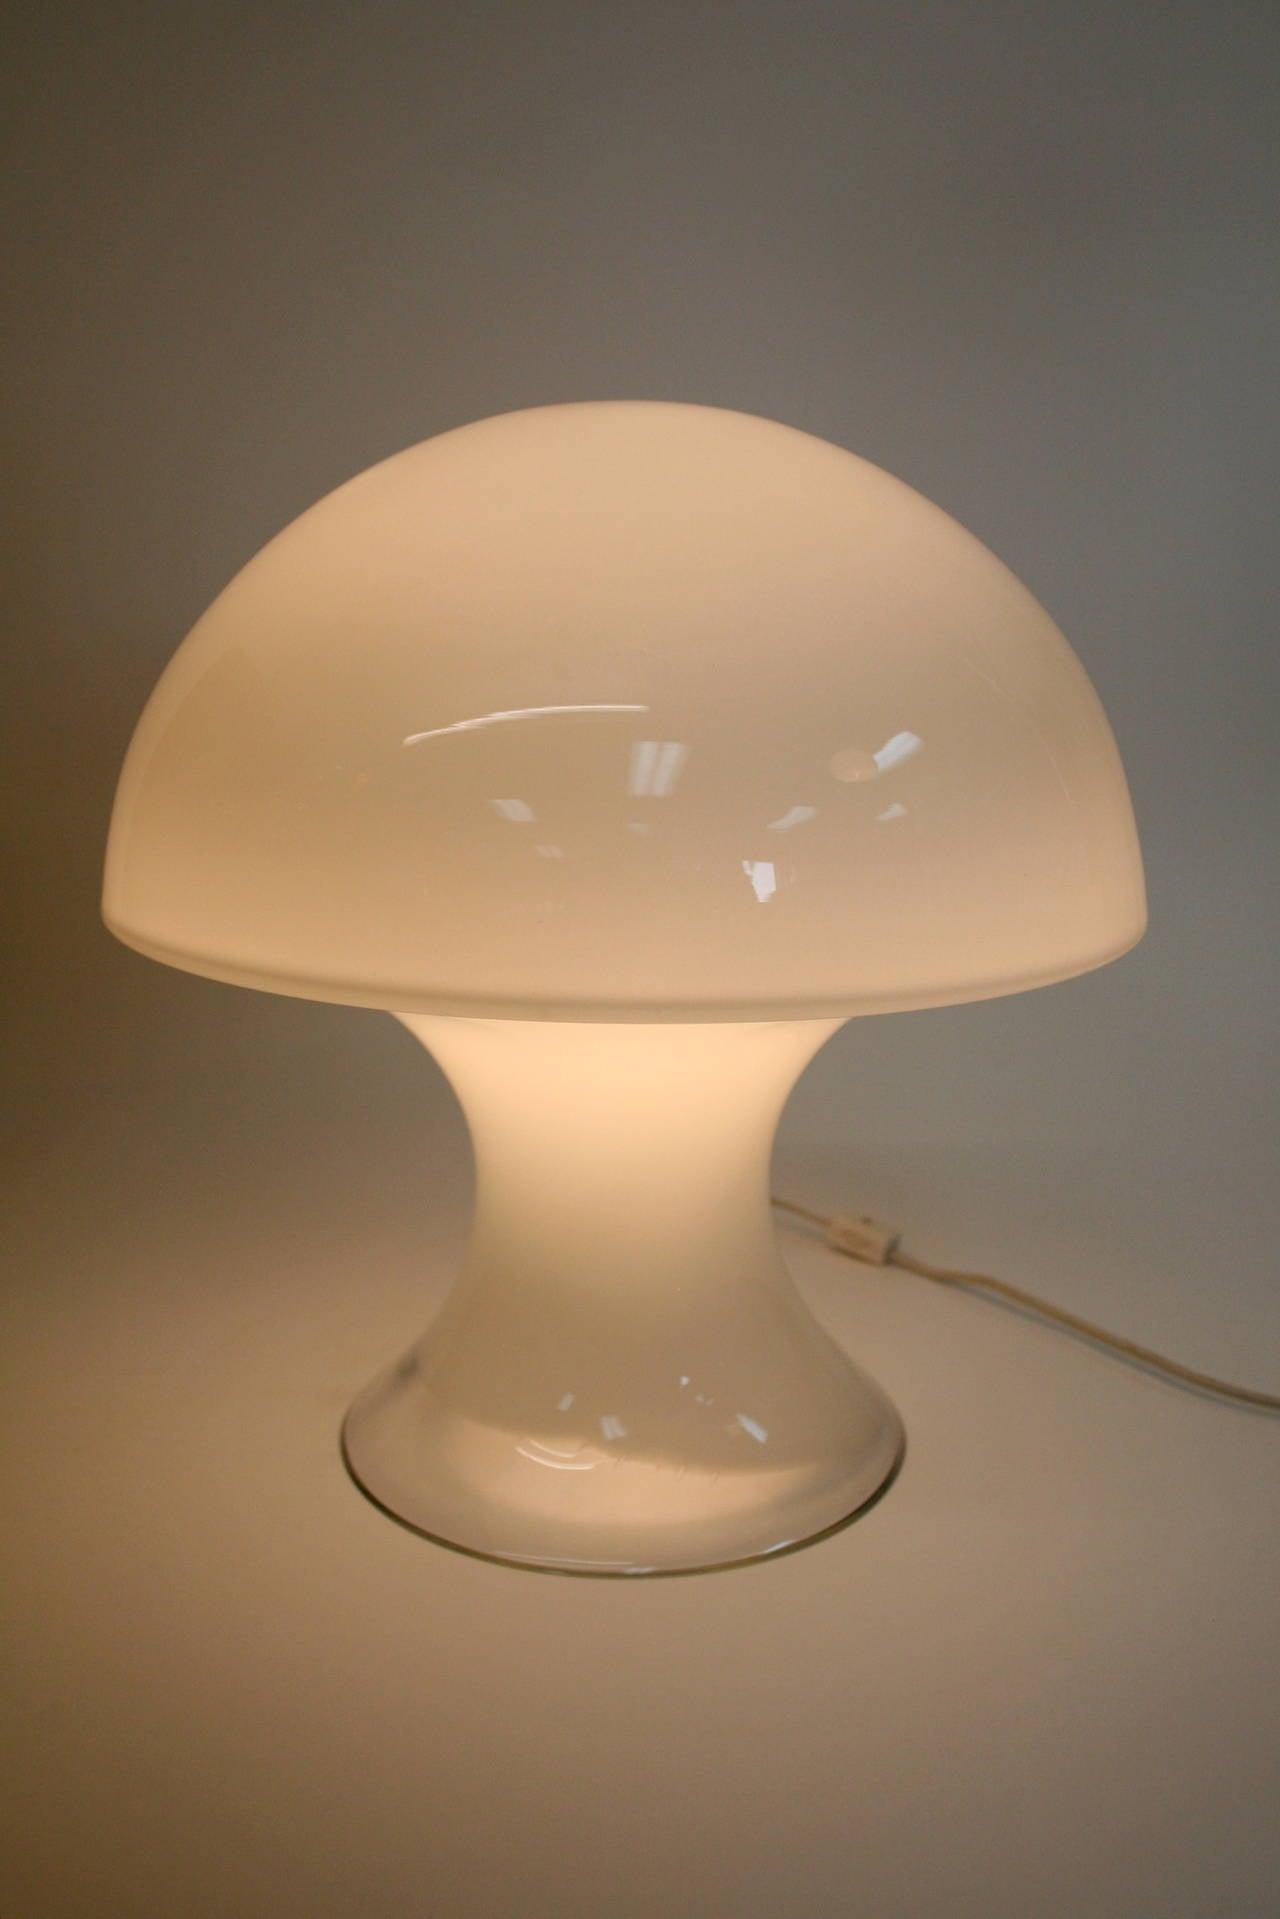 murano glass mushroom lamp by gino vistosi at 1stdibs. Black Bedroom Furniture Sets. Home Design Ideas